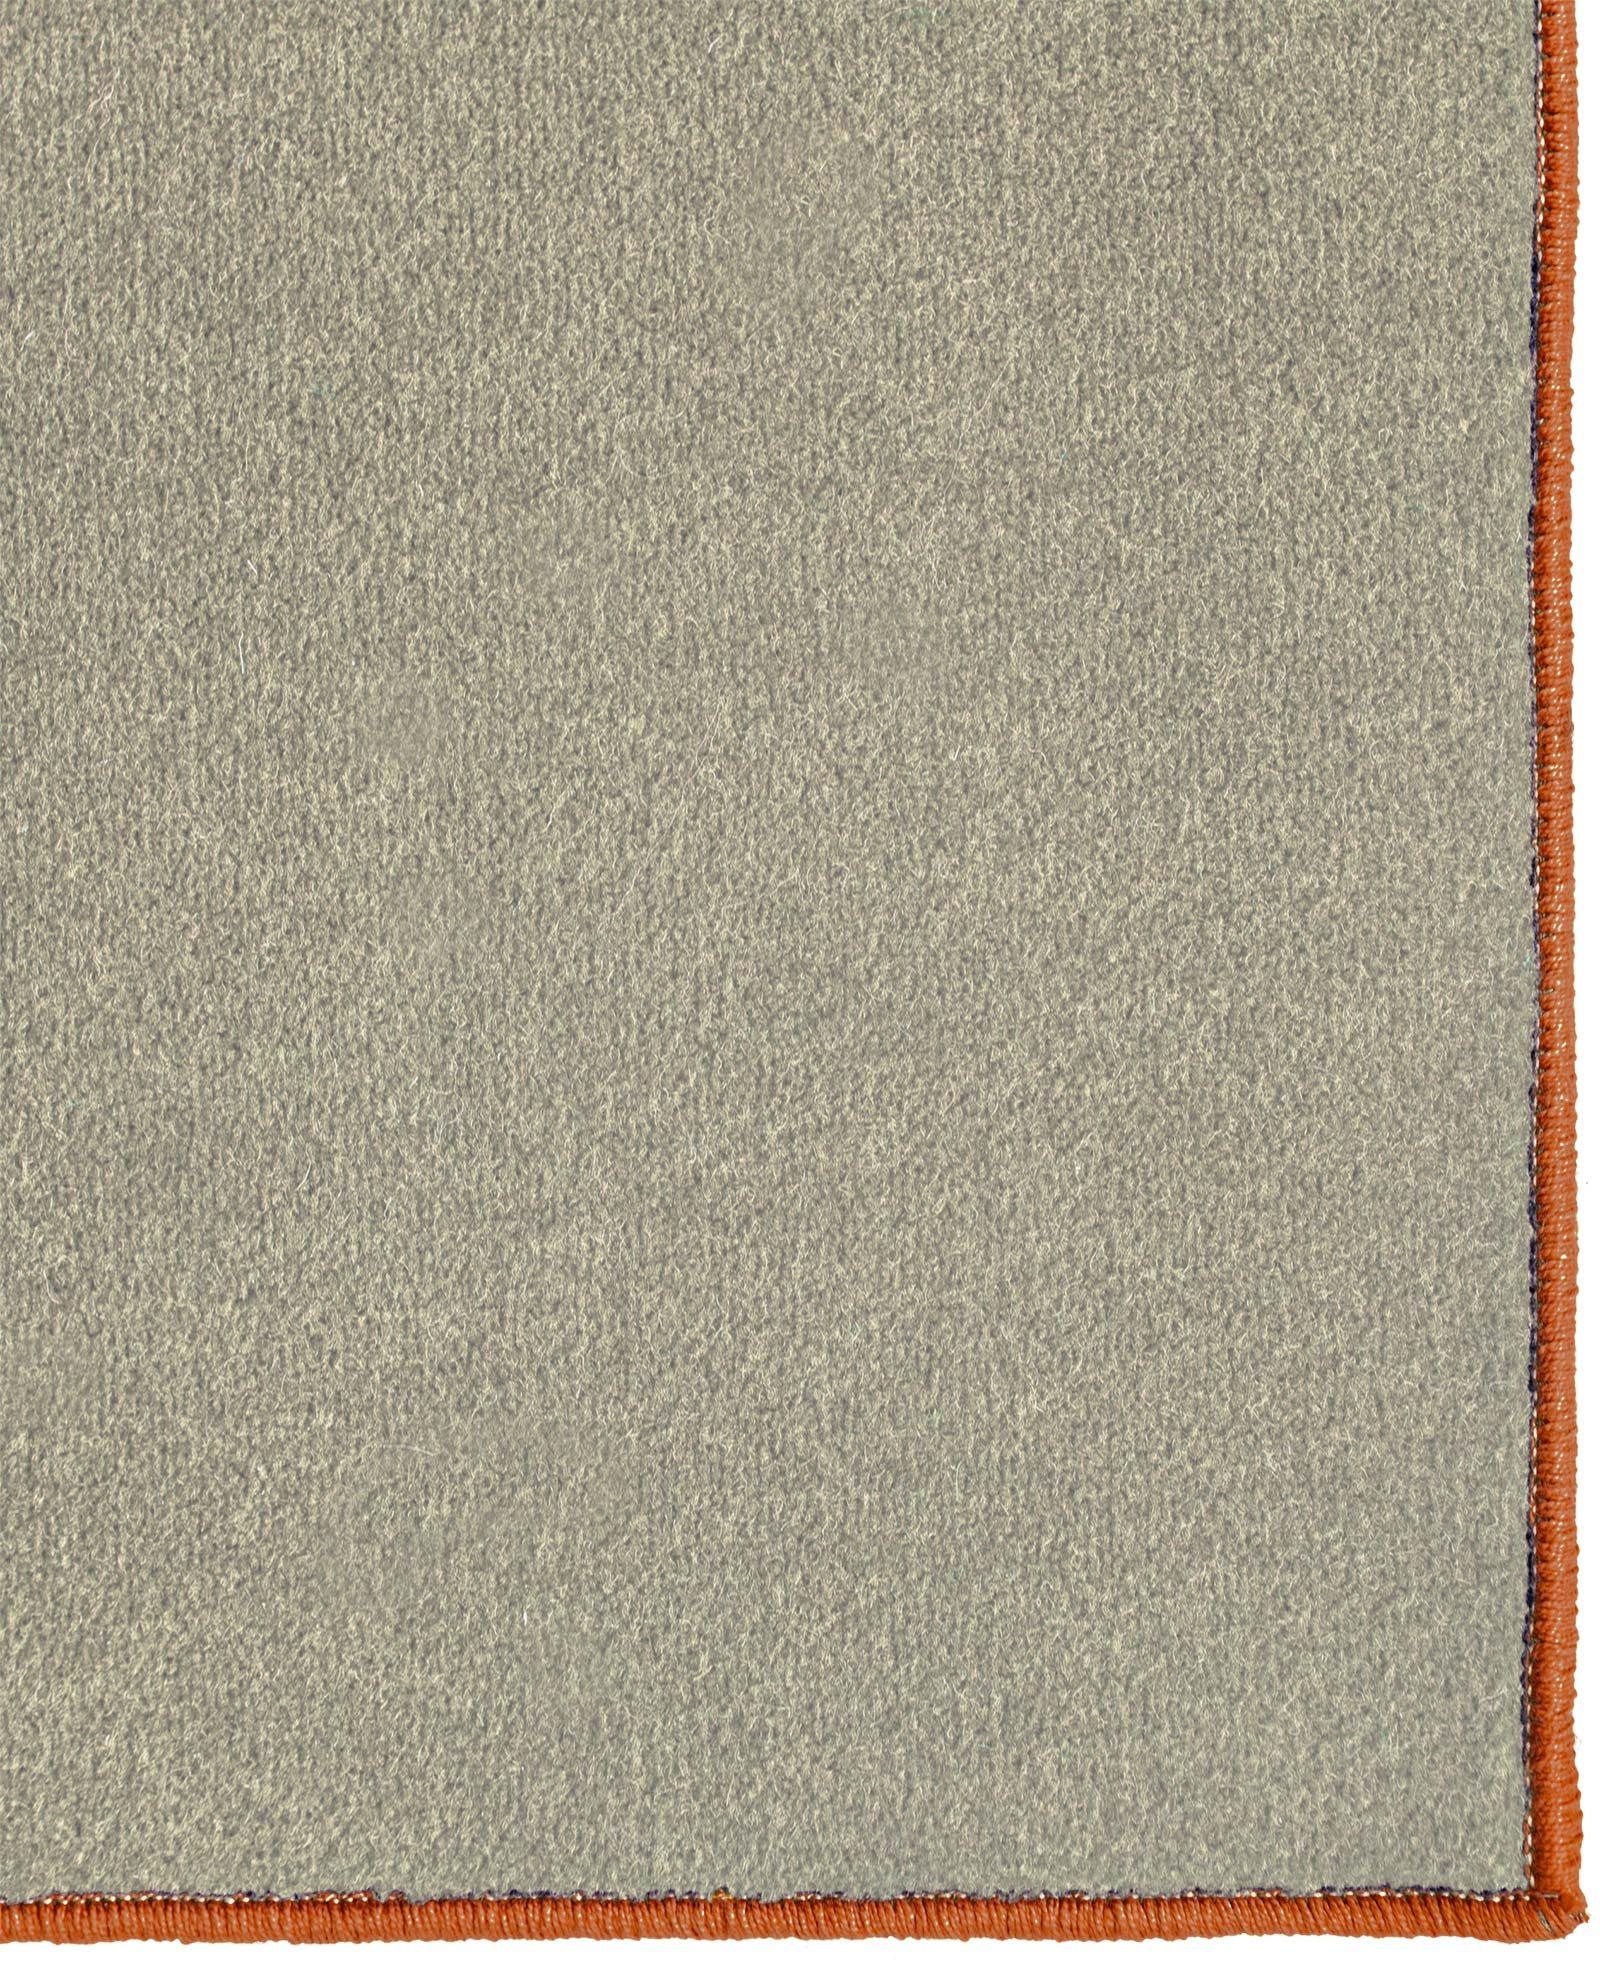 Louis De Poortere Wilton Rugs W Fantasy Richelieu Velours RV7 7015